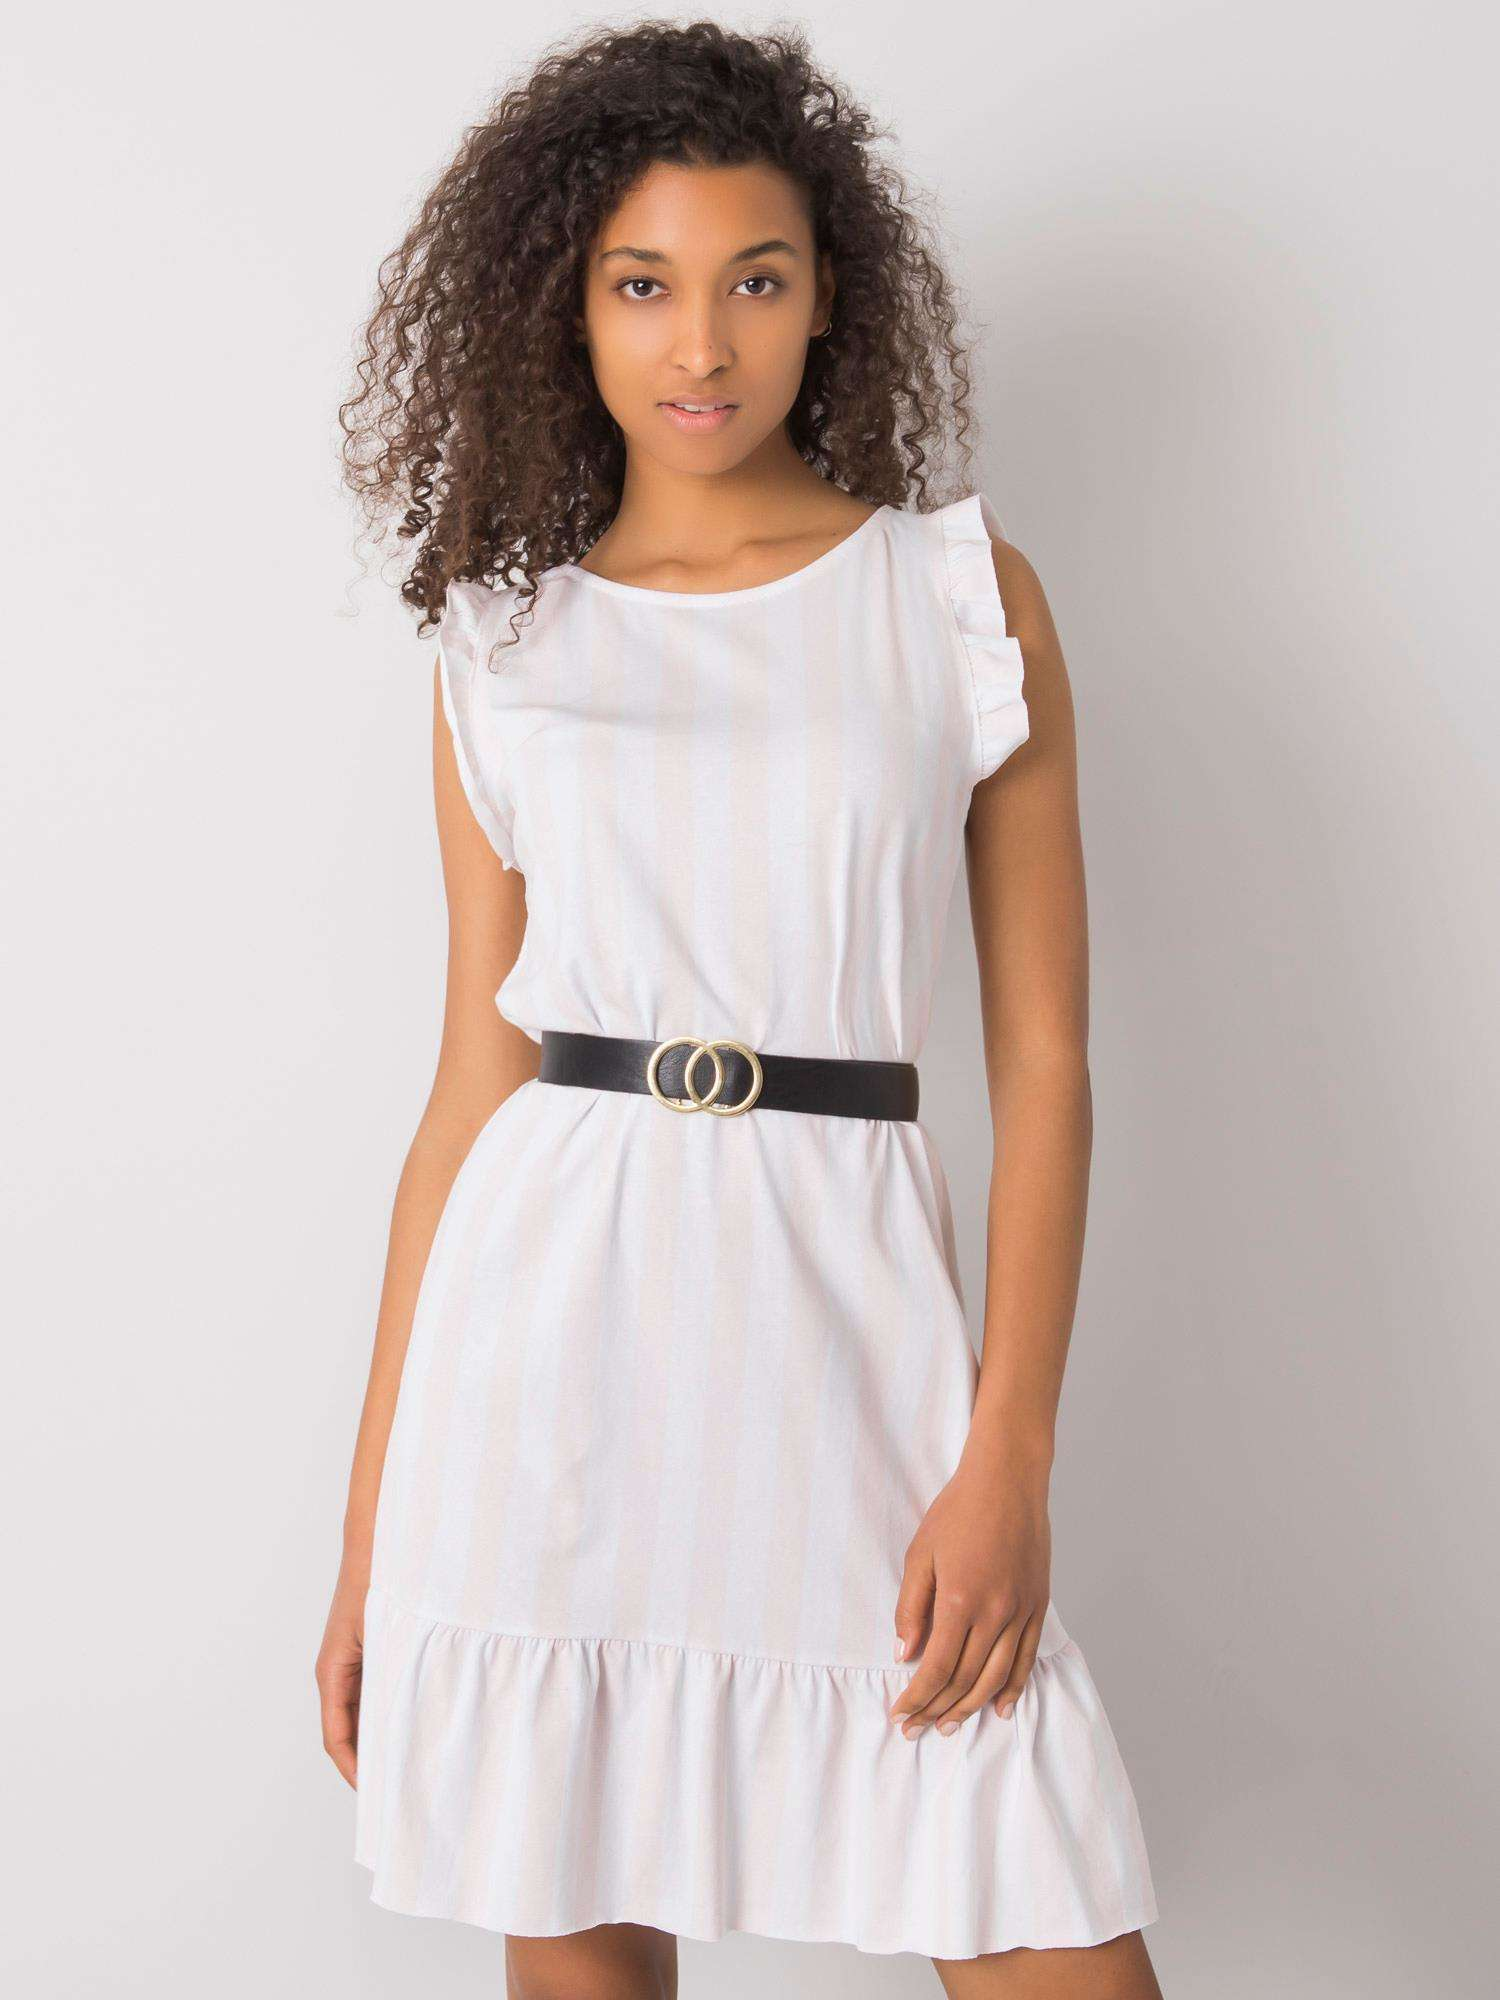 Svetloružové pruhované šaty s volánikmi jedna velikost